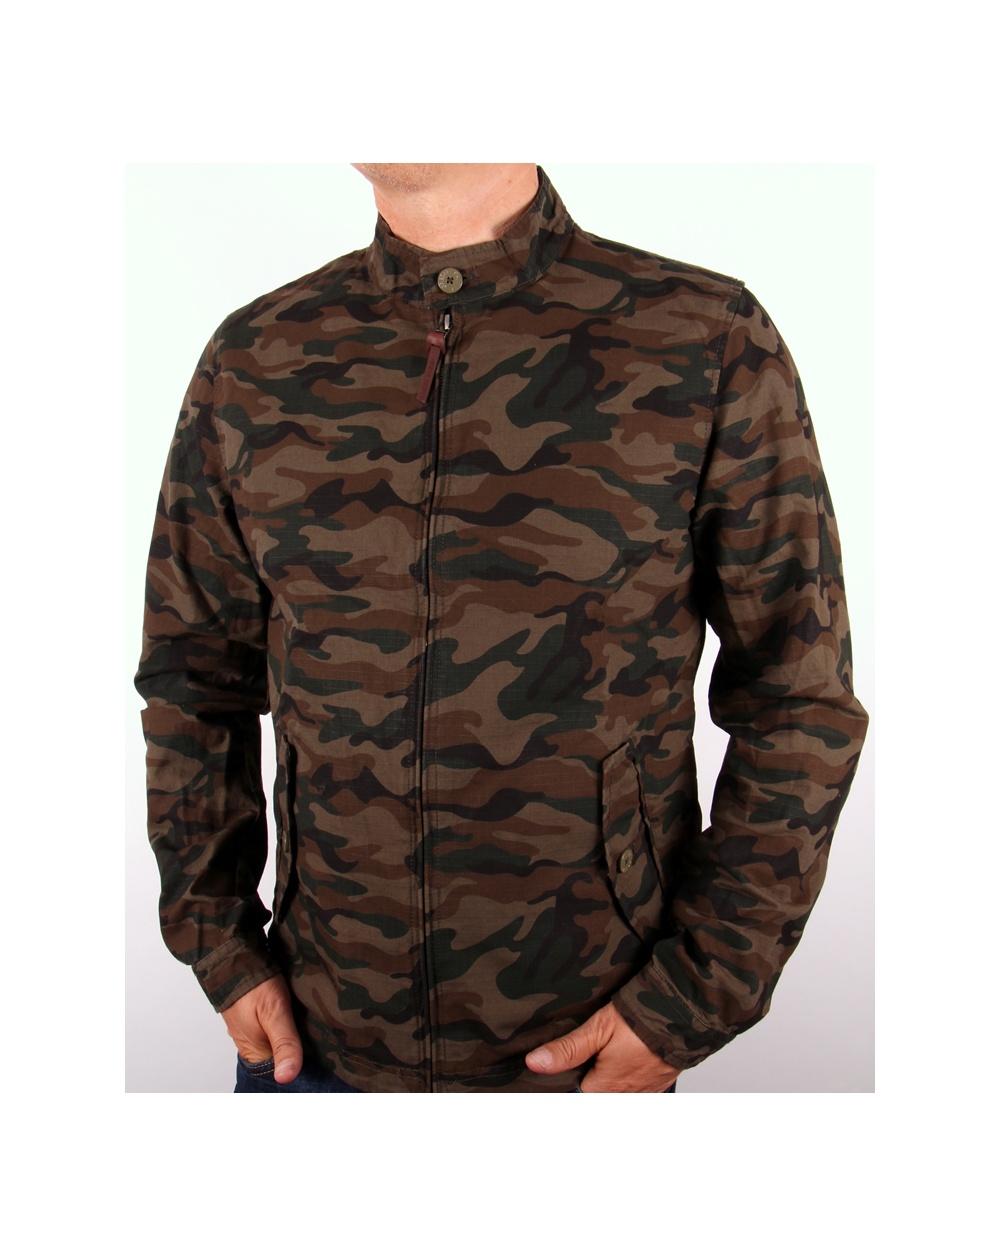 Timberland Jacket Mens